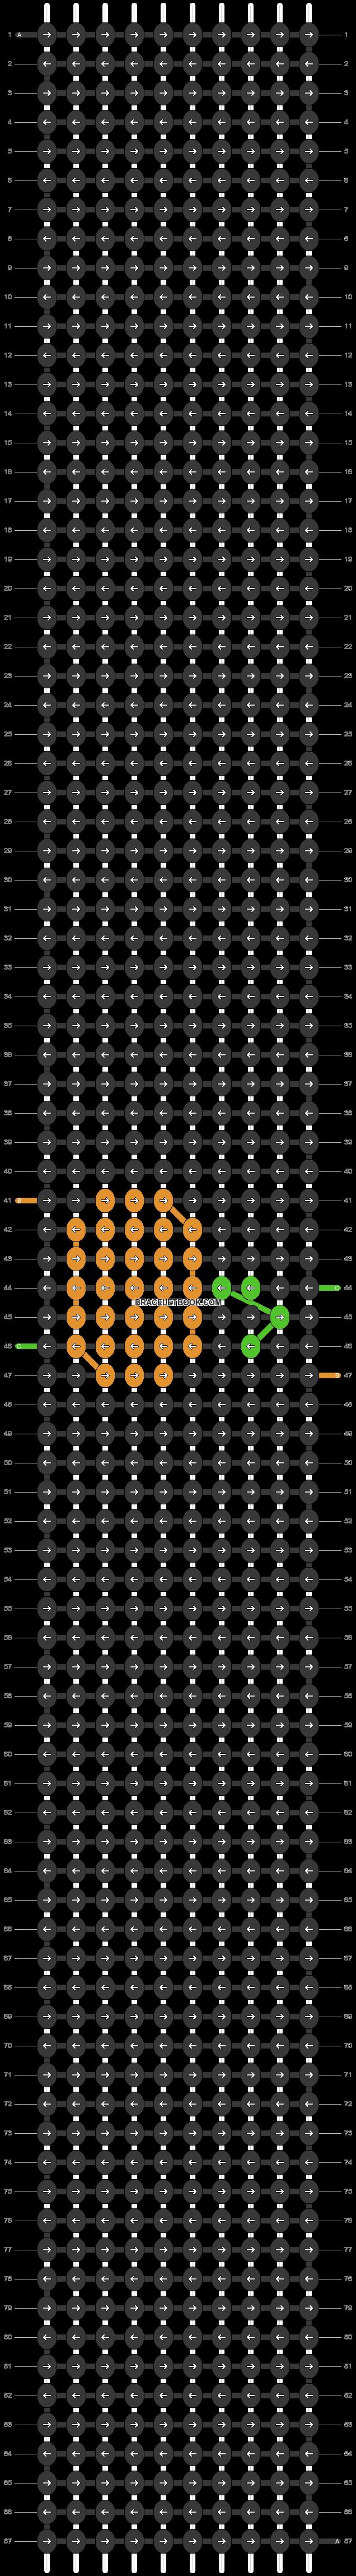 Alpha pattern #102942 pattern